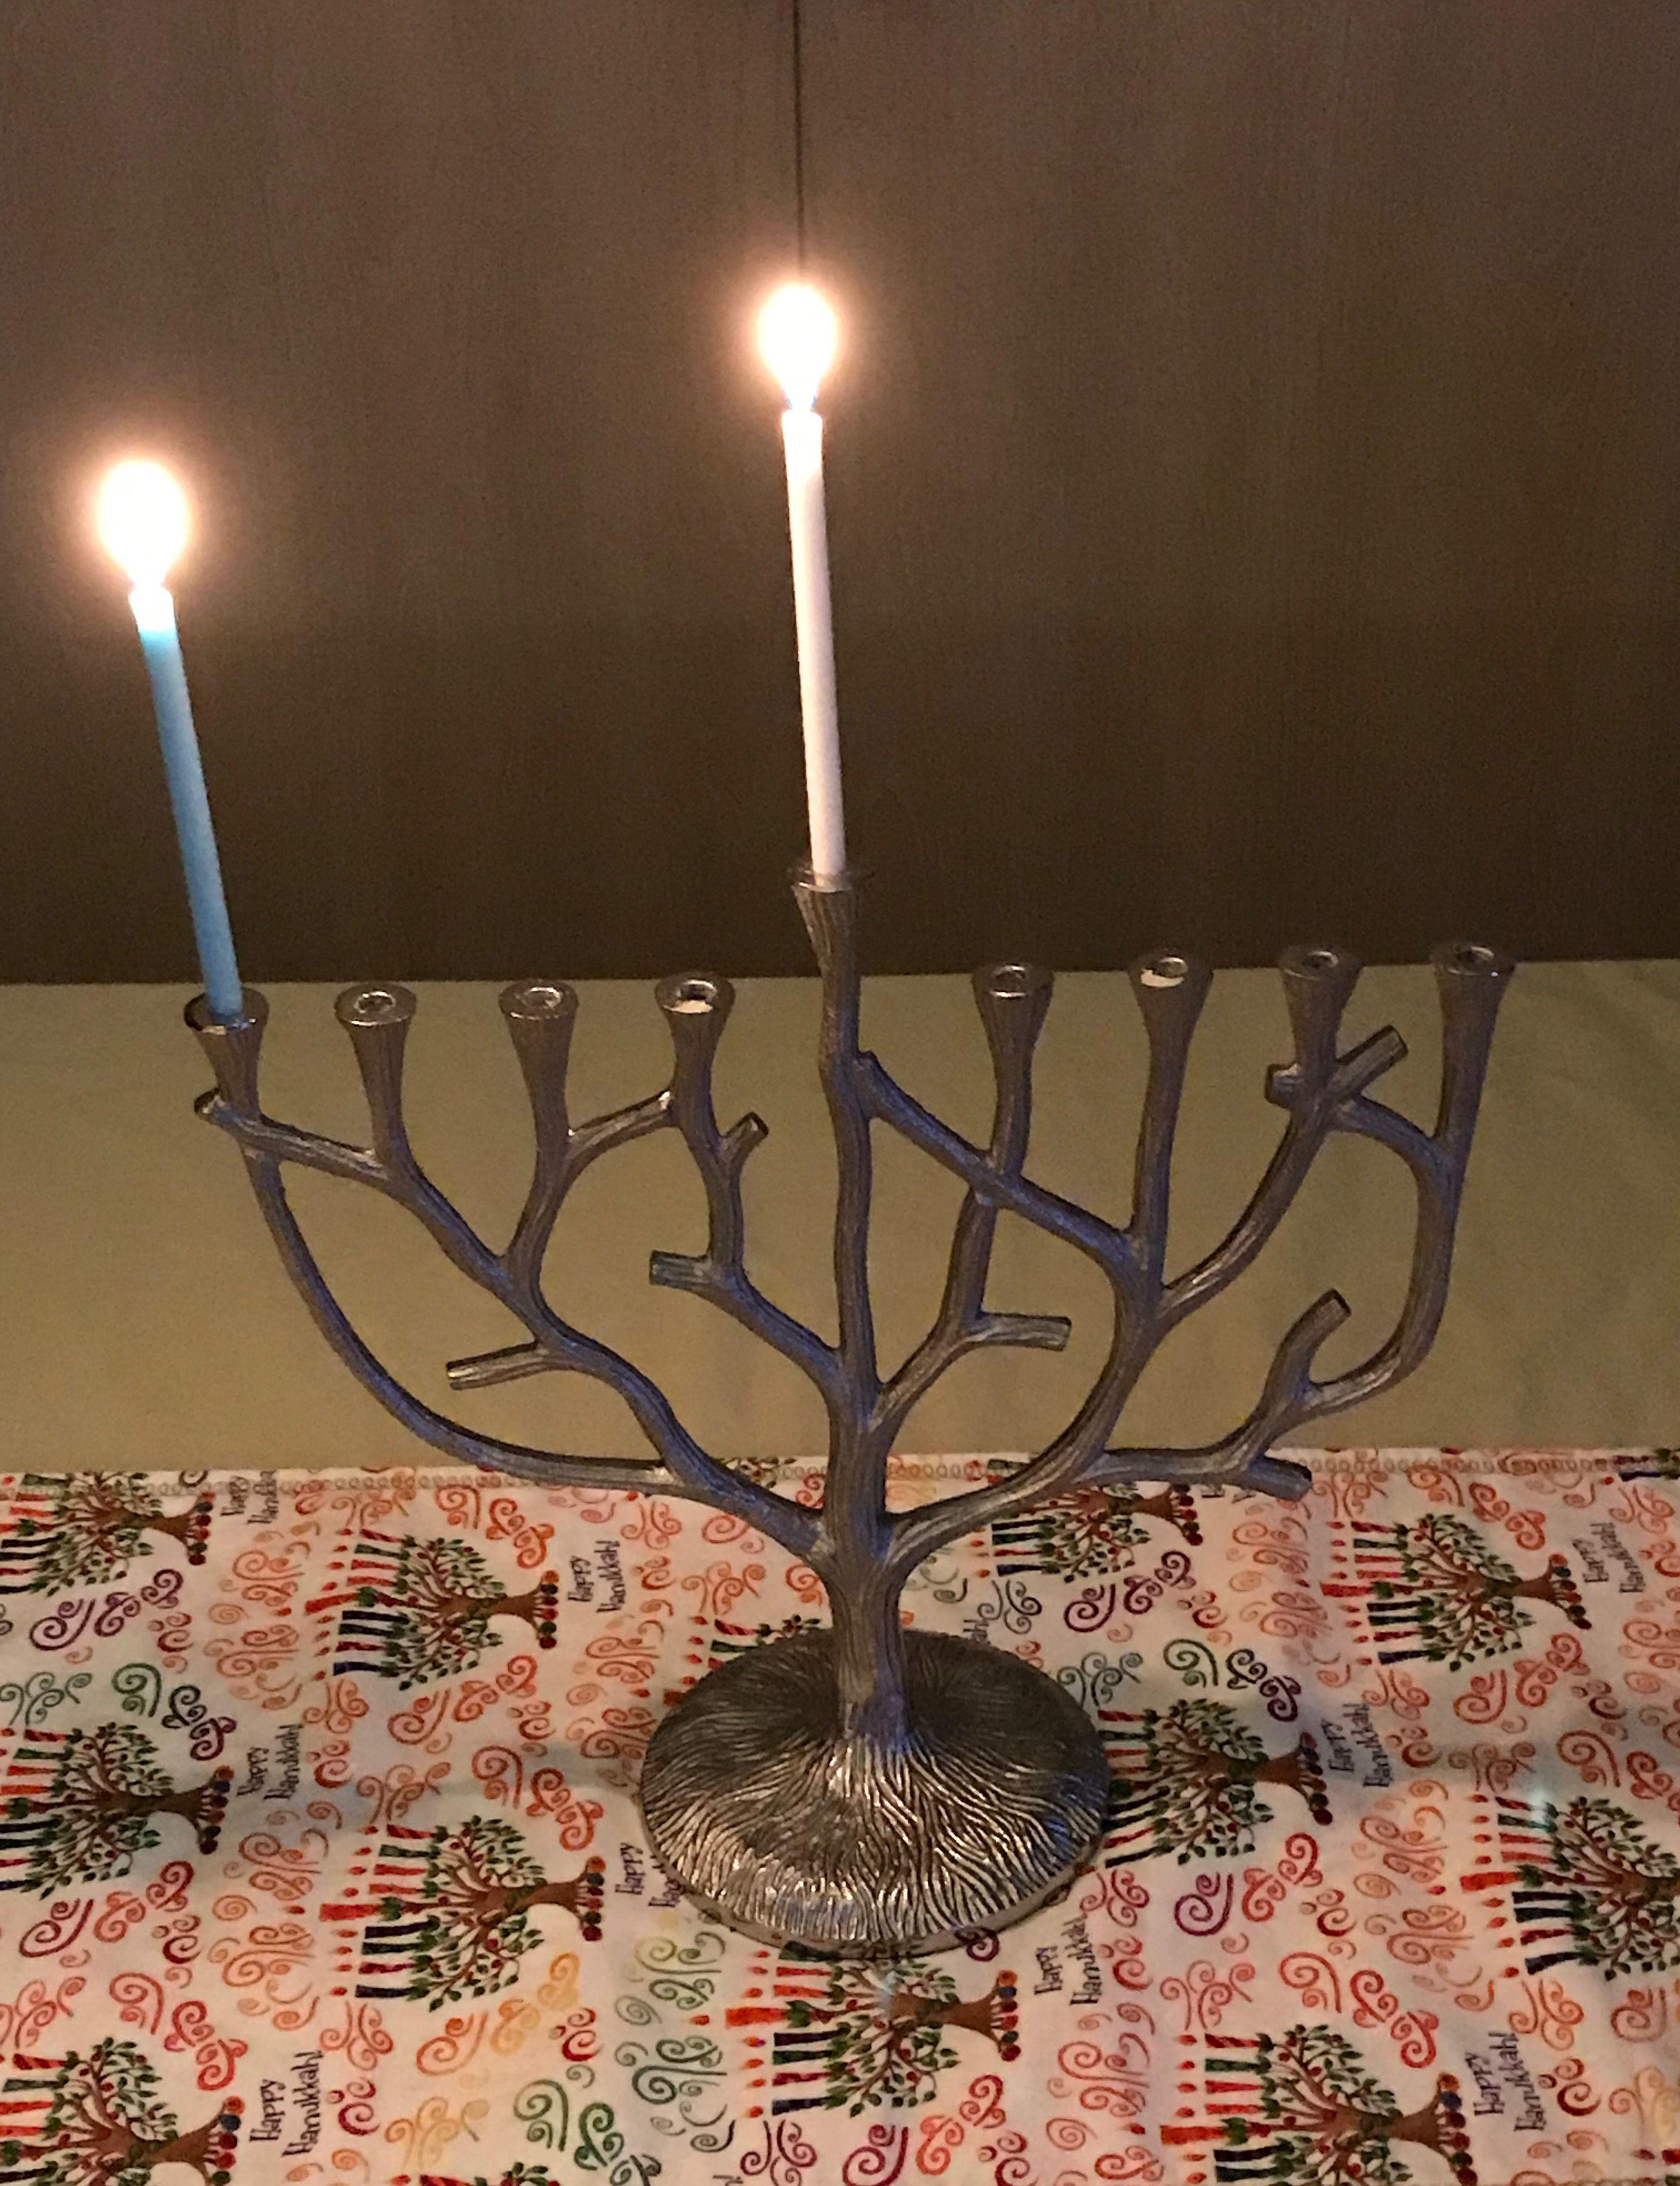 Happy Hanukkah Happyhanukkah Seasonofmiracles